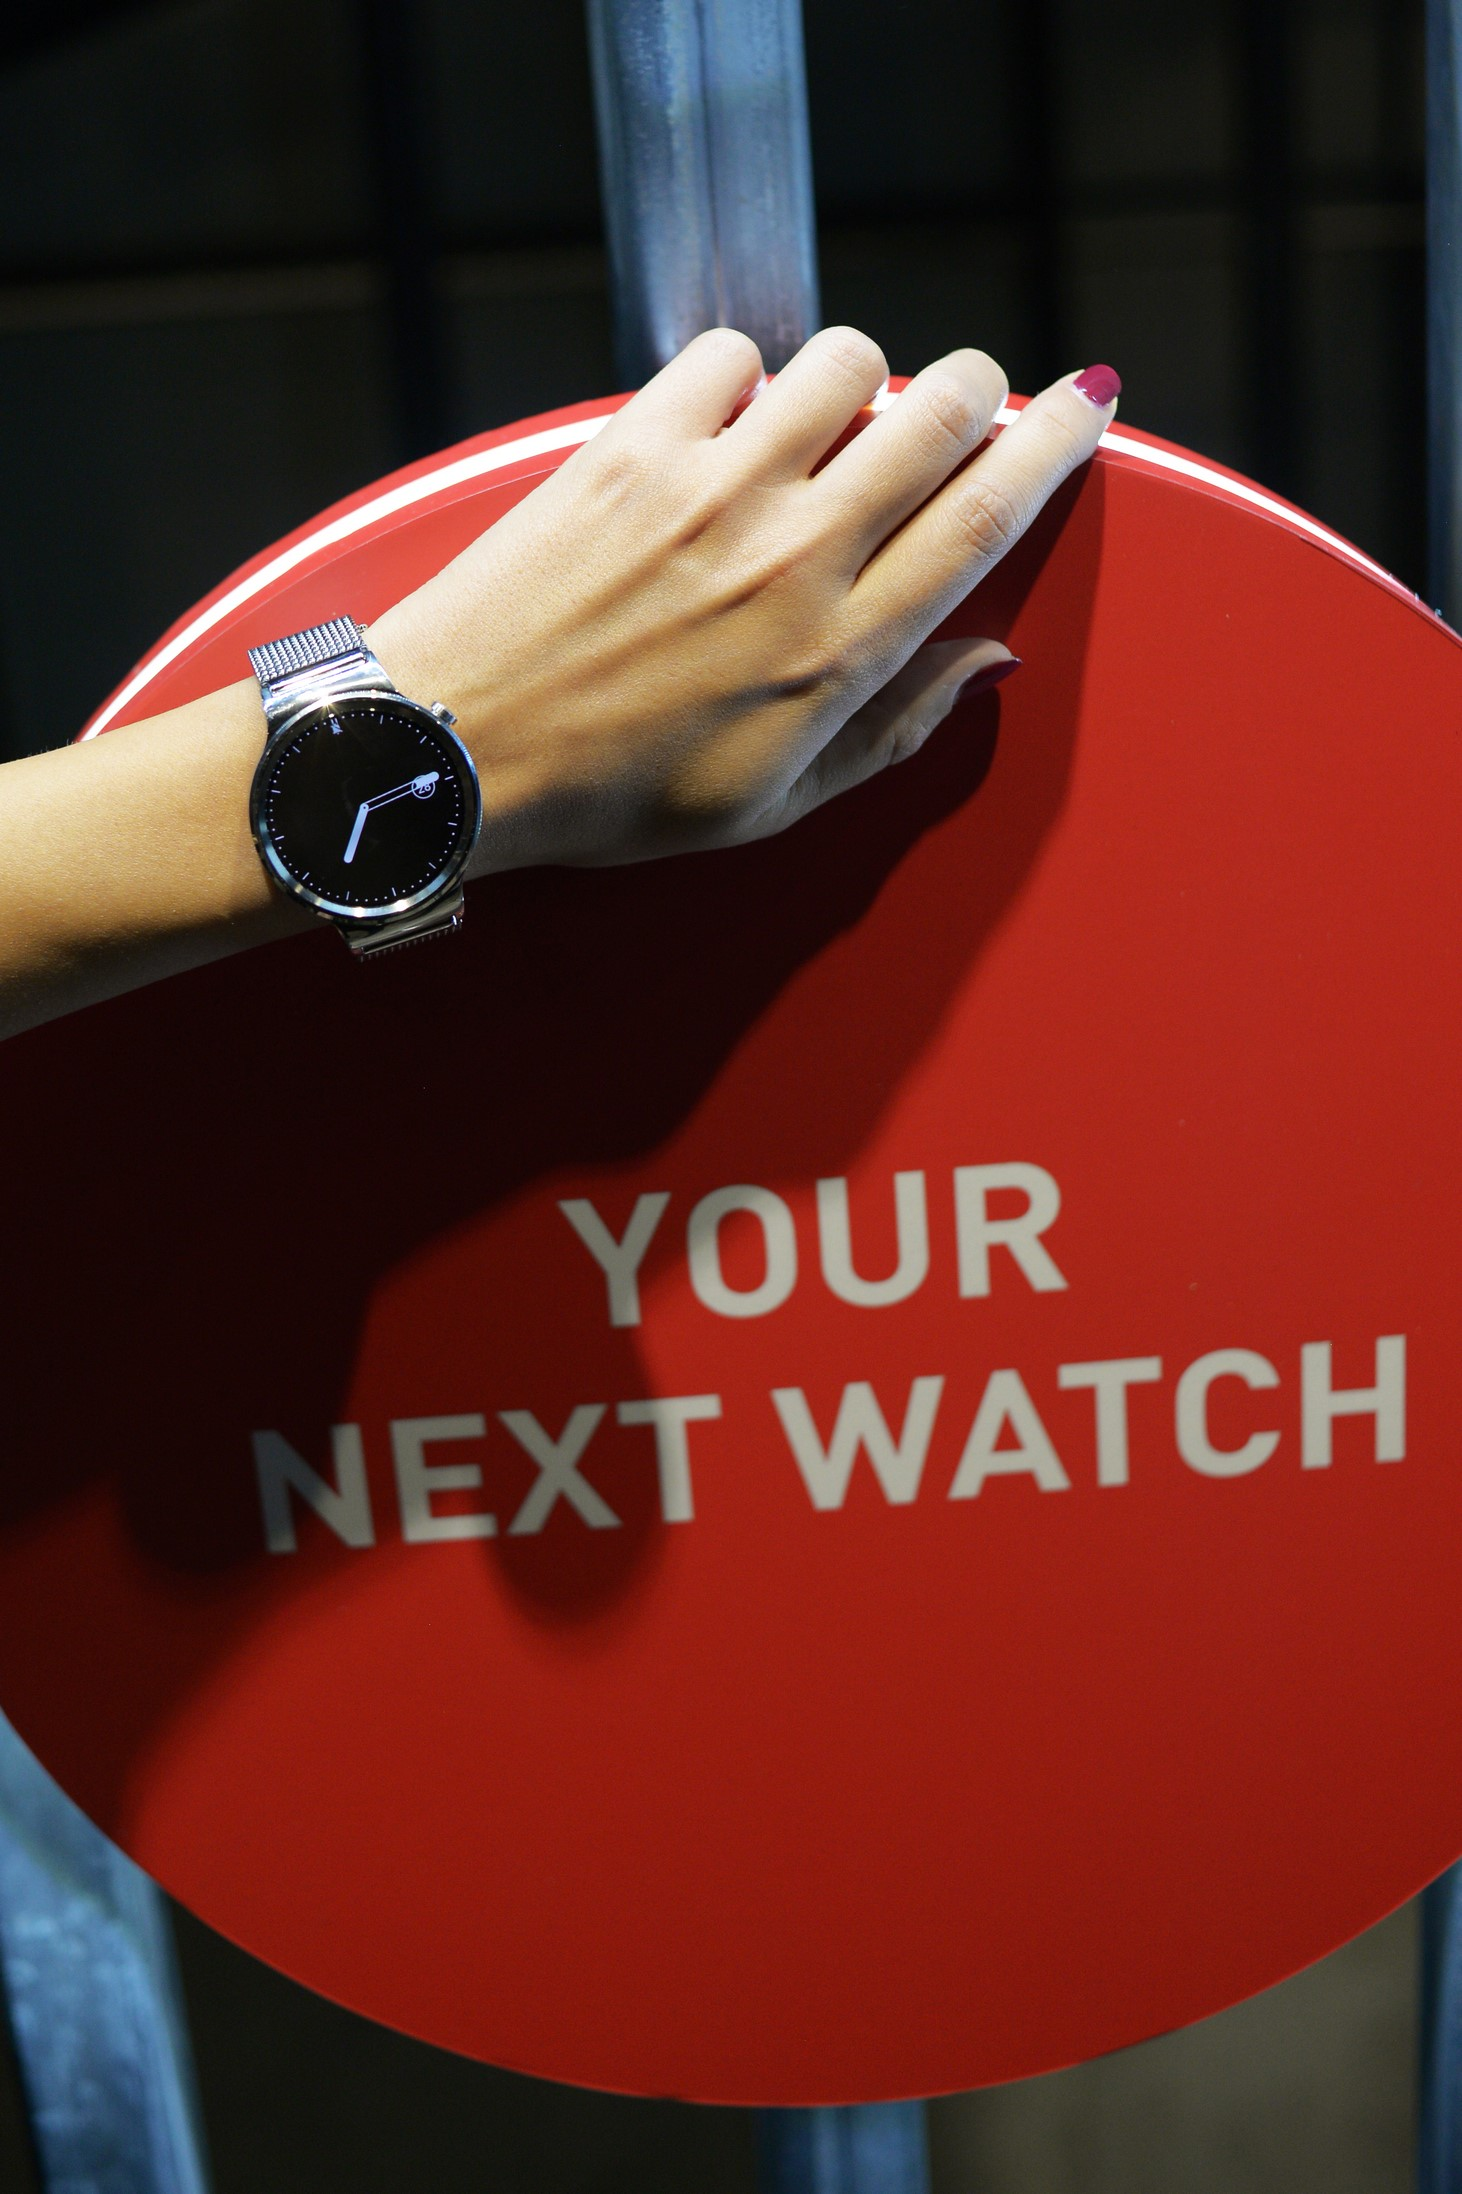 Huawei Watch, lansat oficial în România